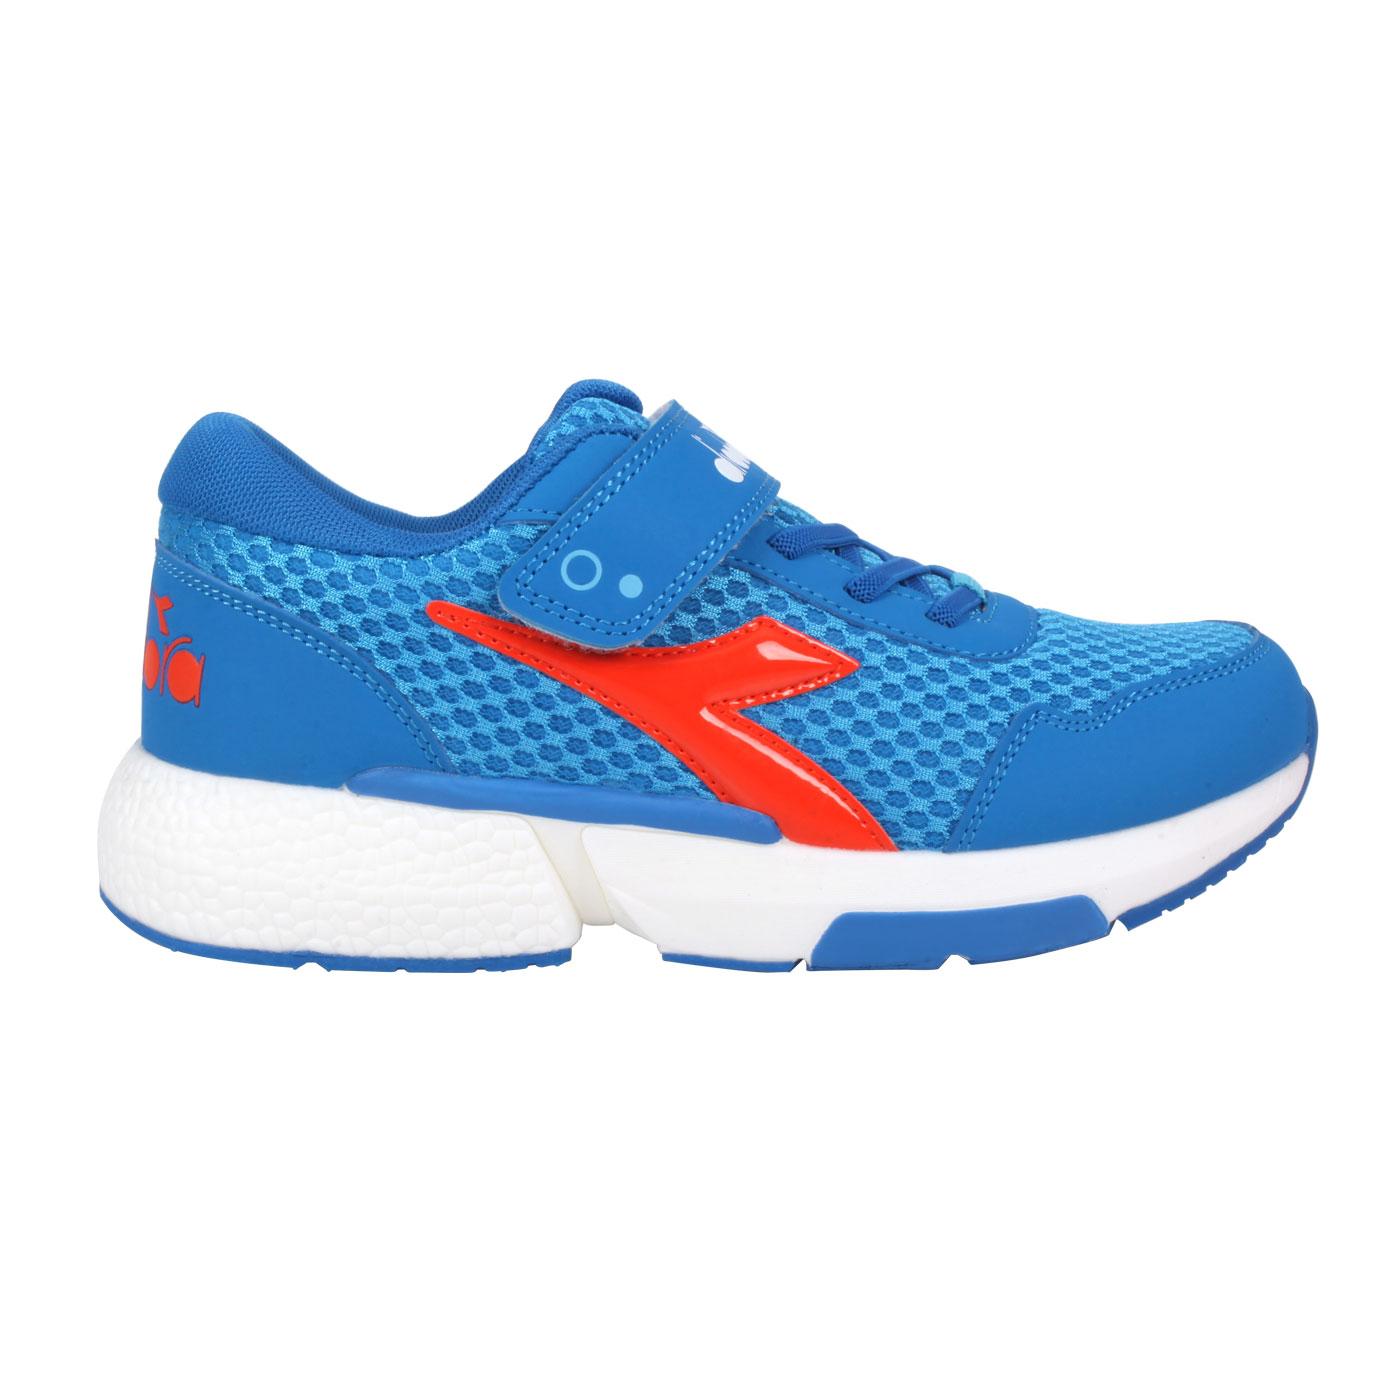 DIADORA 大童專業慢跑鞋-超寬楦 DA11031 - 藍橘